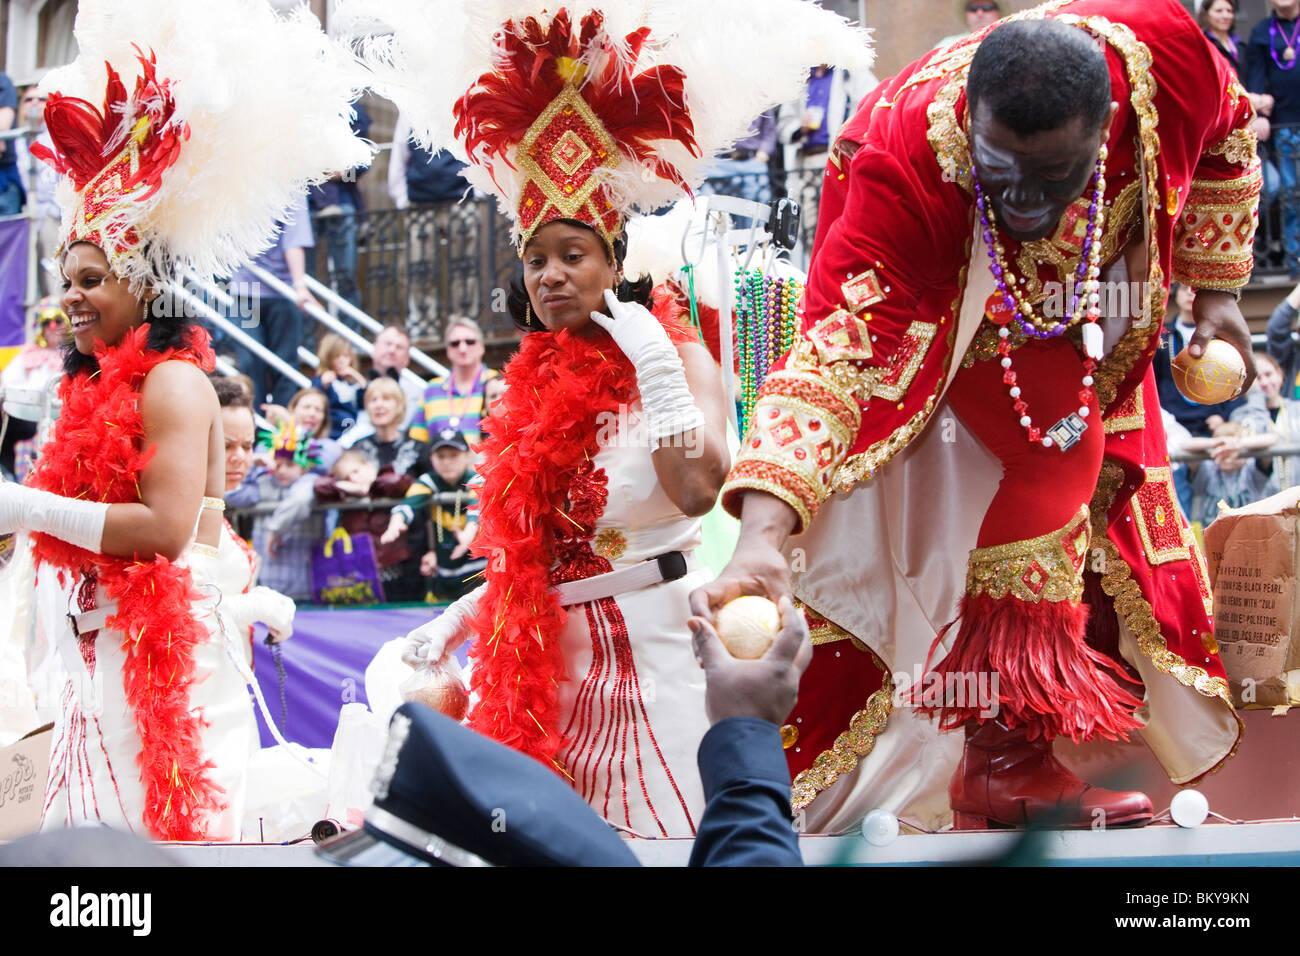 Carnival Parade on Mardi Gras, French Quarter, New Orleans, Louisiana, USA Stock Photo